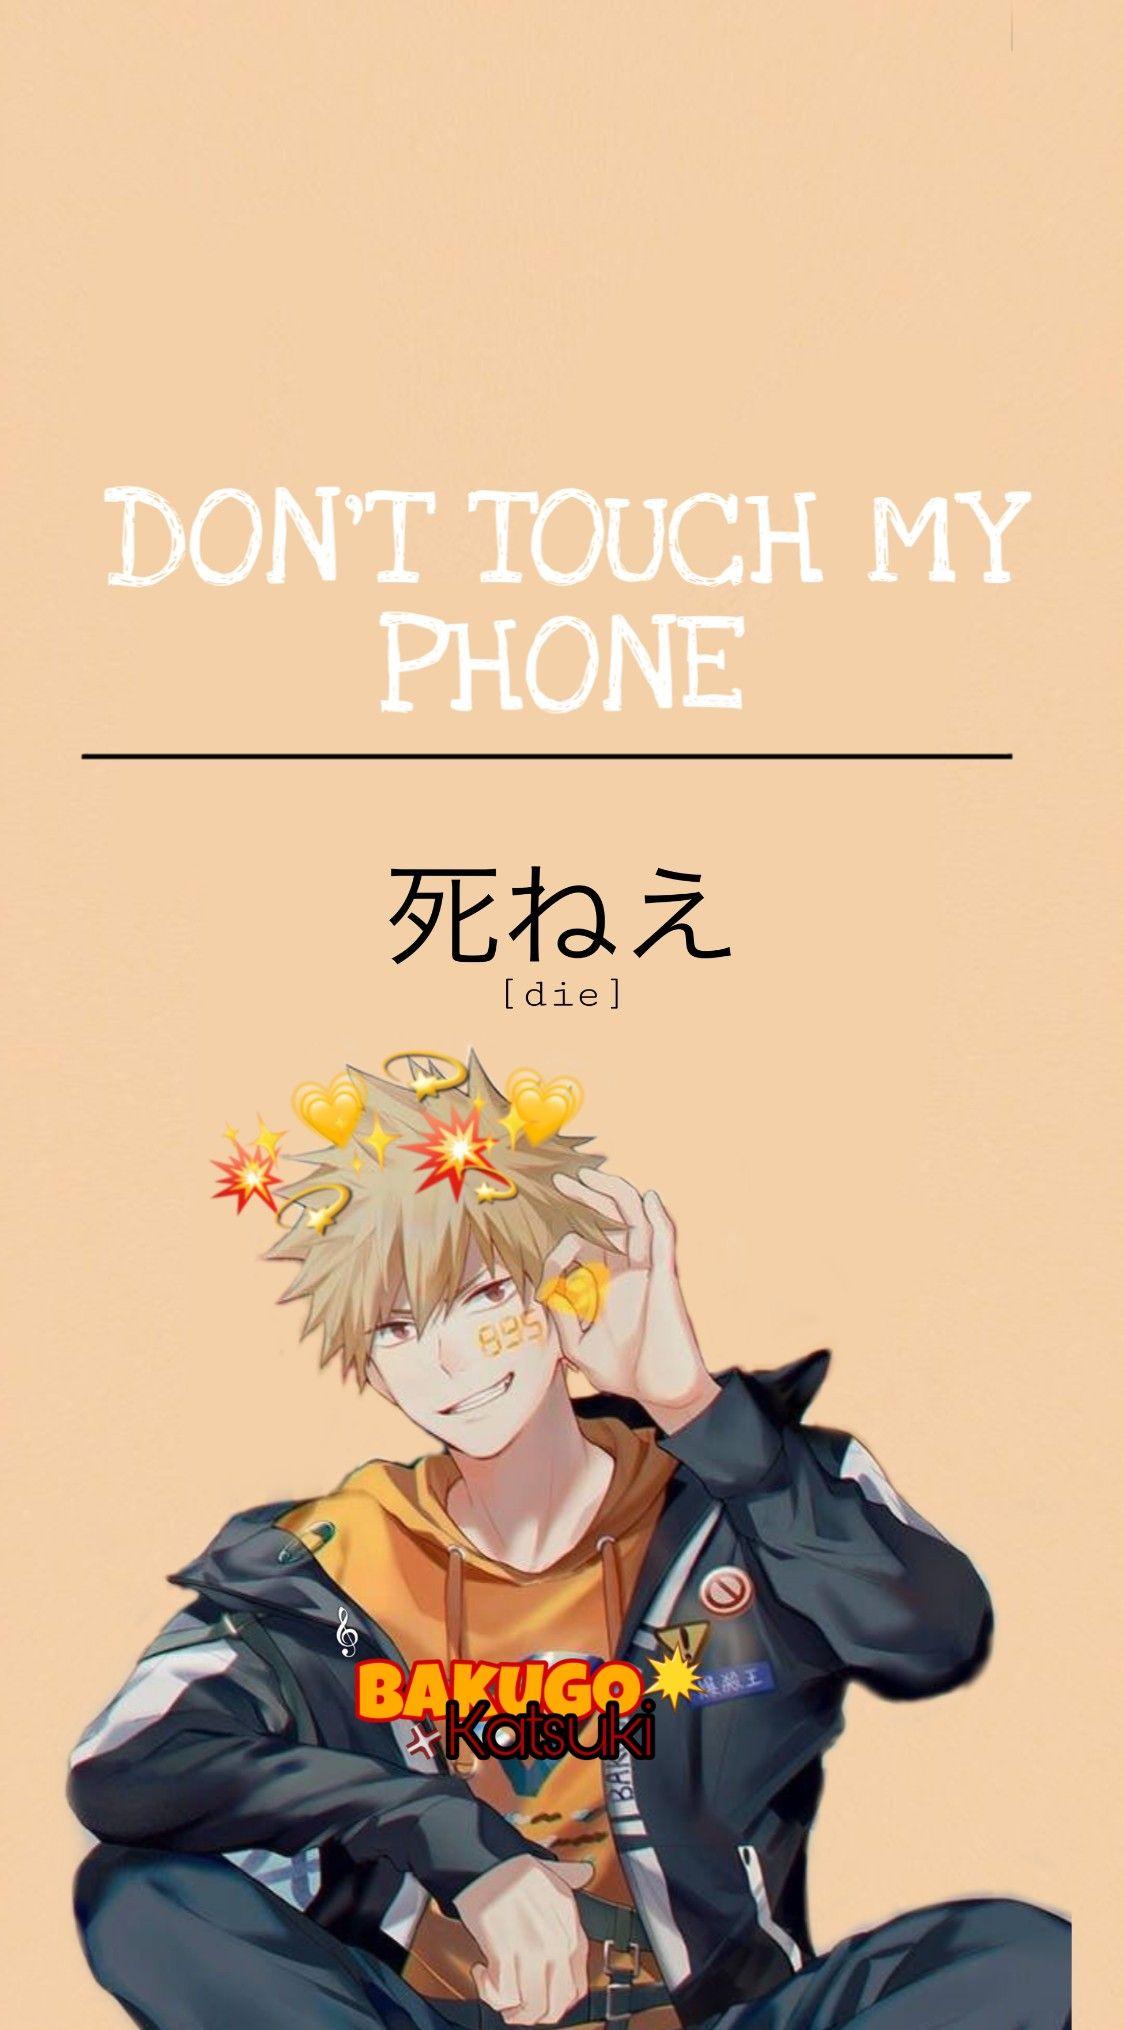 Bakugou Katsuki Wallpaper Cute Anime Character Cute Anime Wallpaper Anime Wallpaper Phone